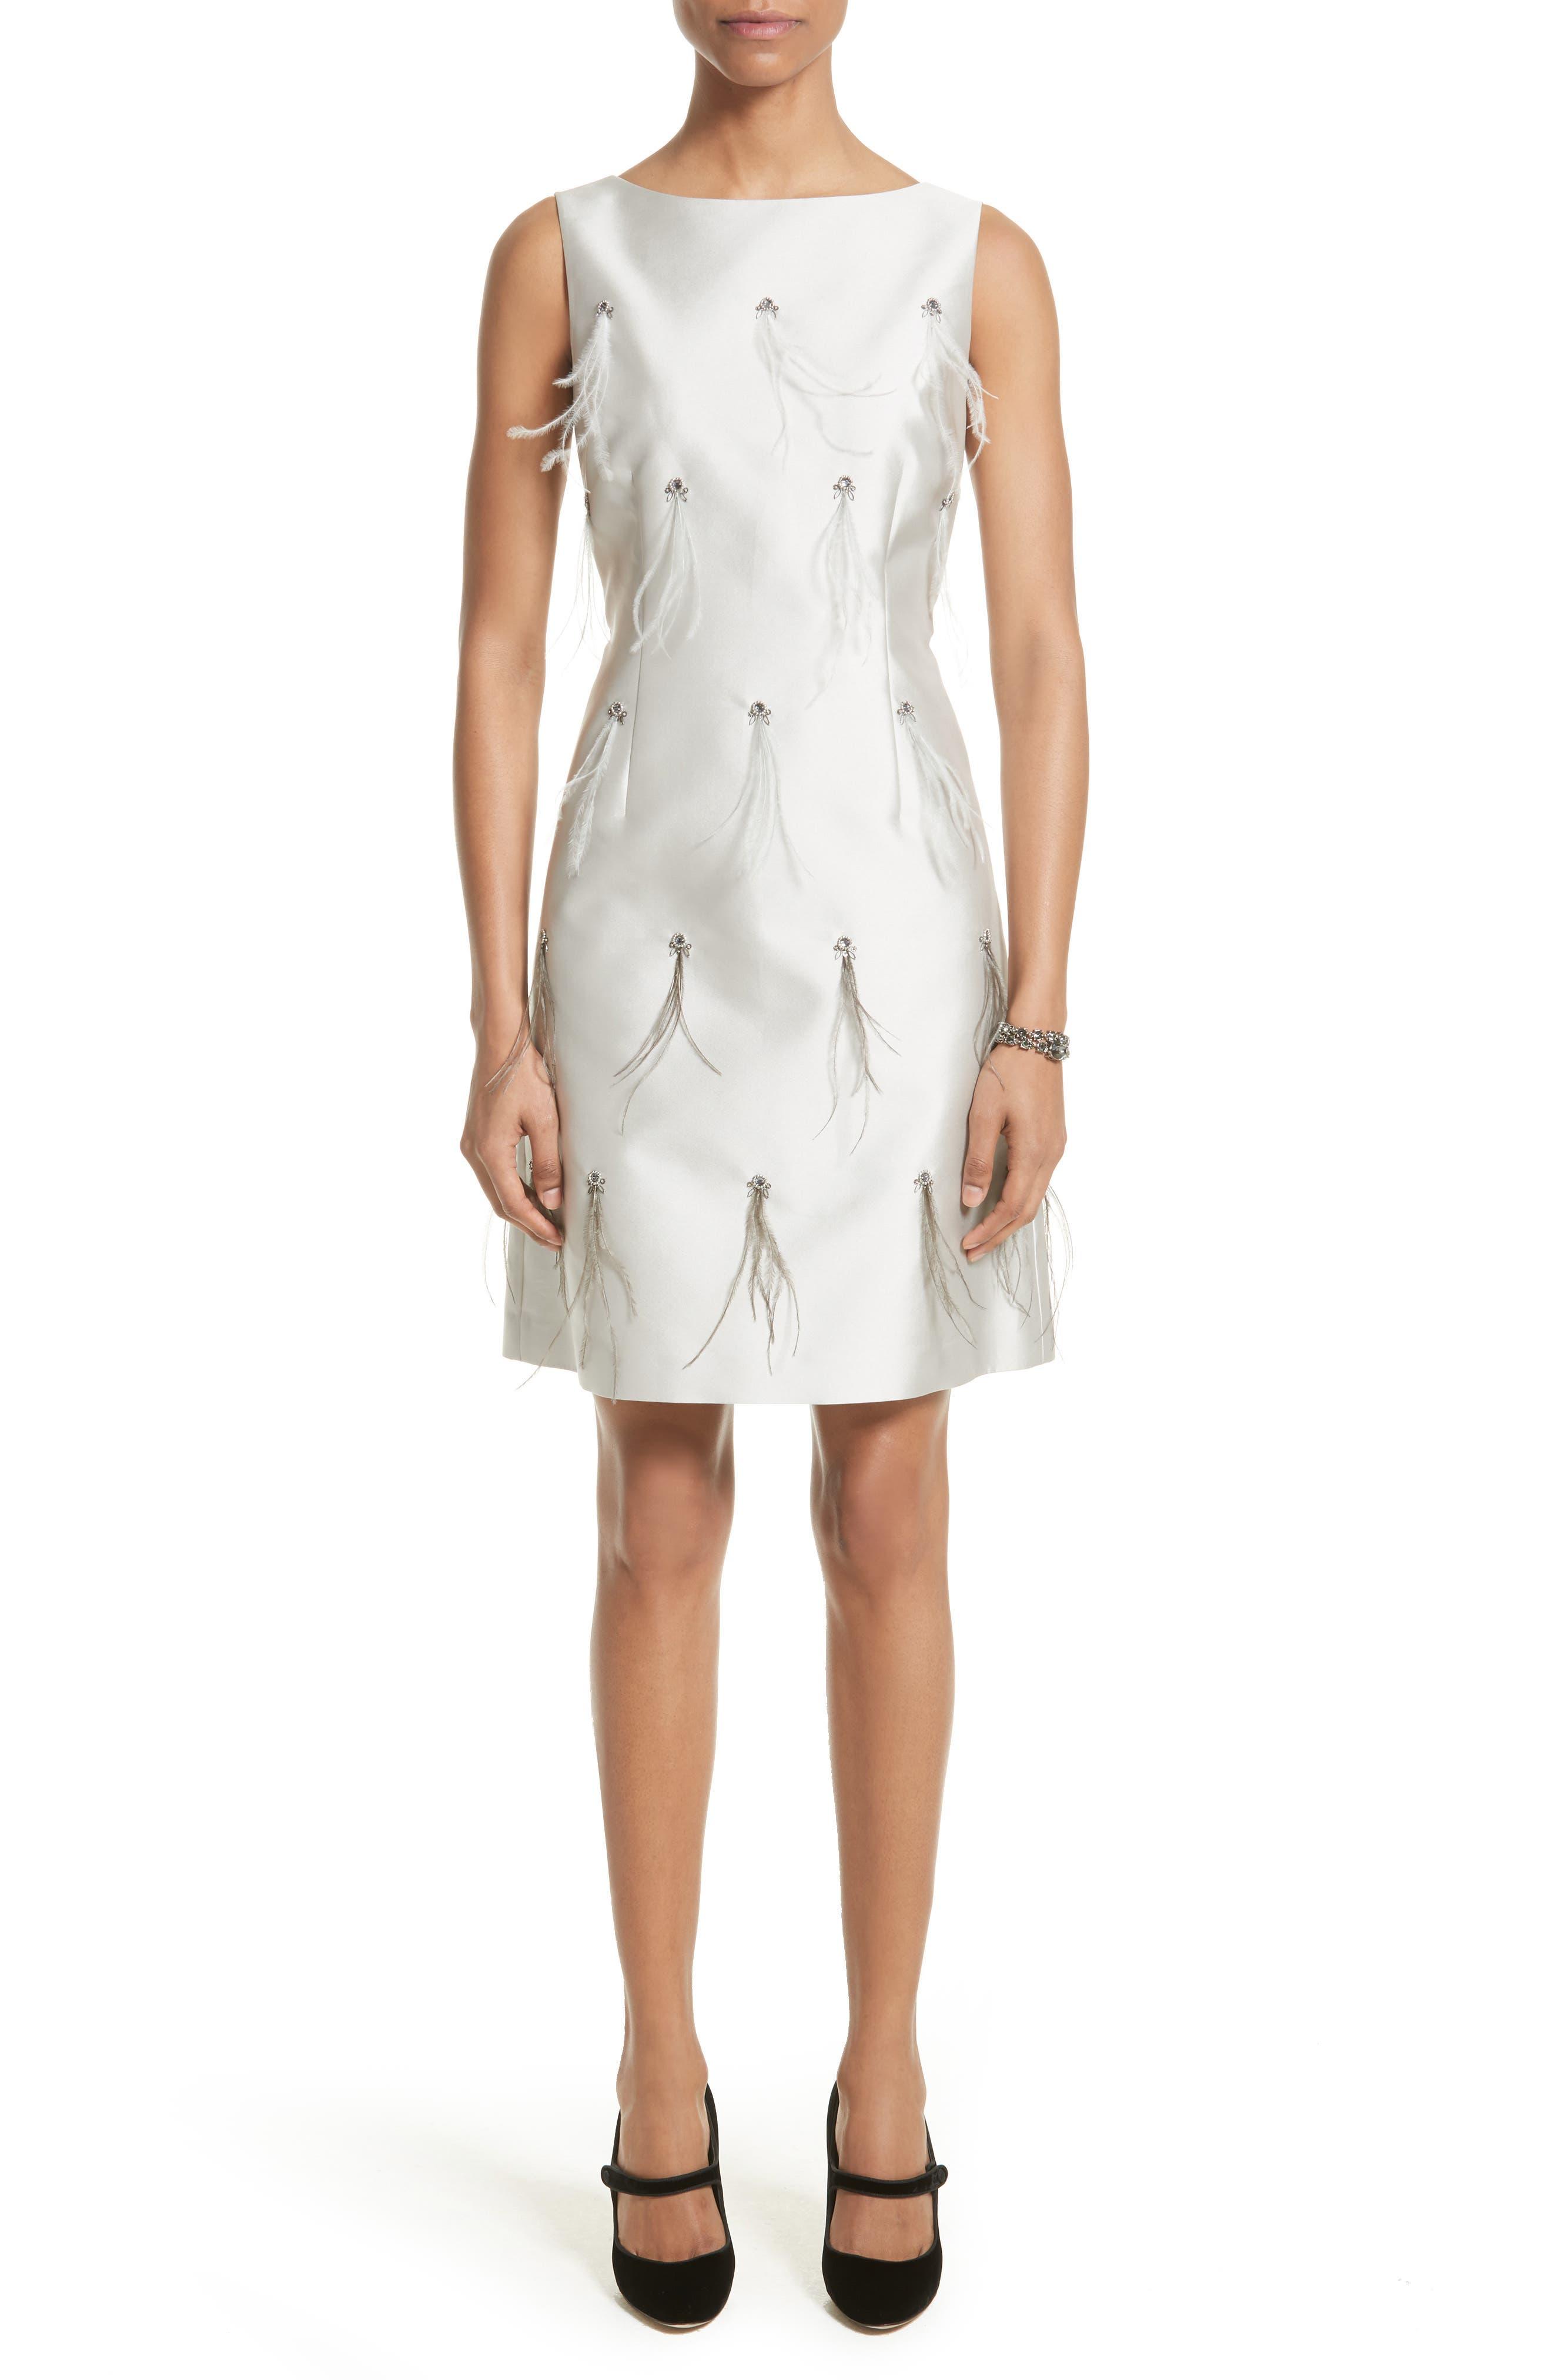 Alternate Image 1 Selected - St. John Collection Mikado Embellished A-Line Dress